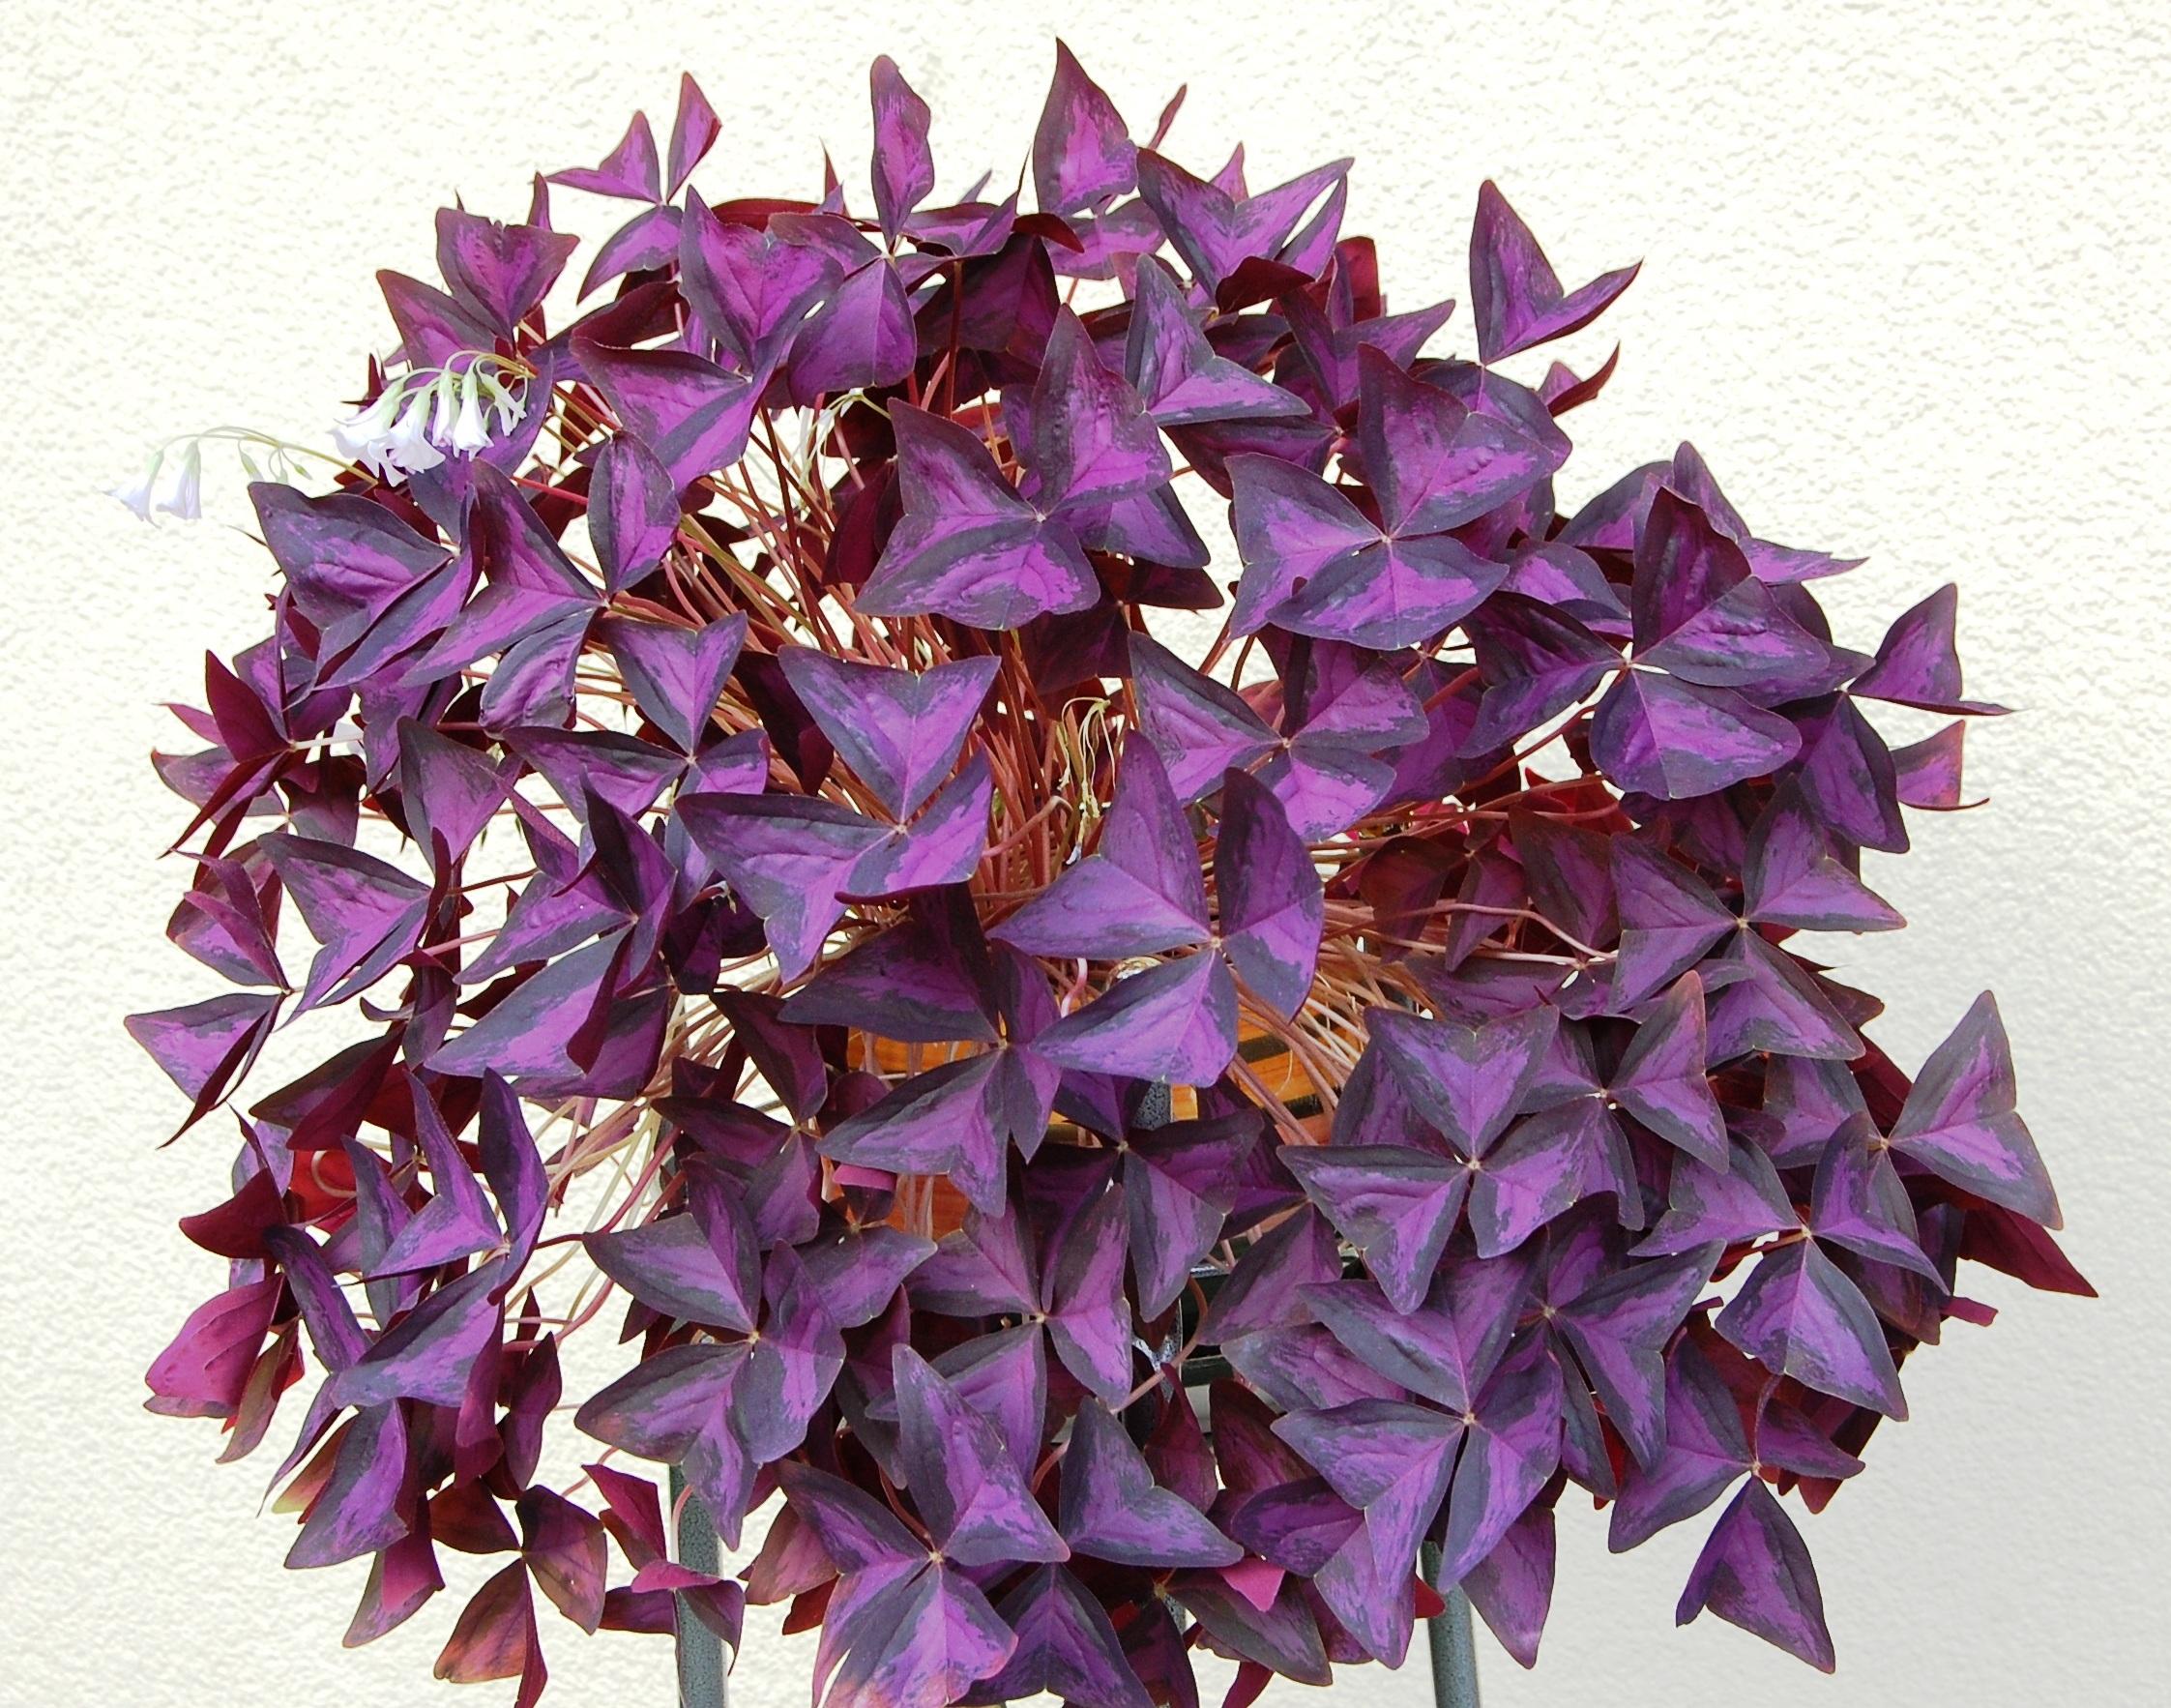 Fotos gratis : rueda, flor, púrpura, pétalo, trébol, art, planta ...